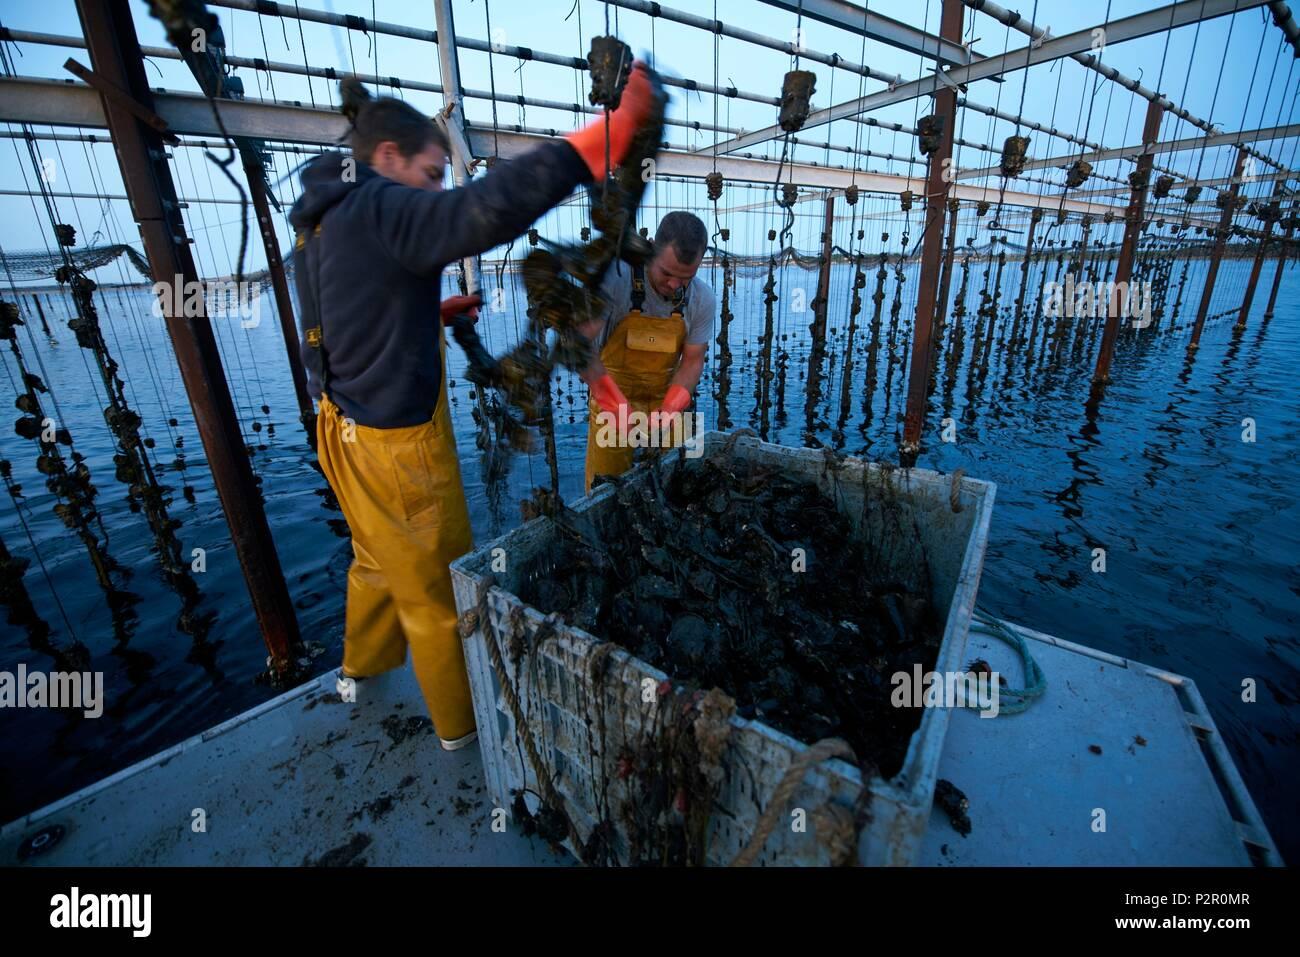 France, Herault, Marseillan, oyster farming, Tarbouriech company, oyster farming, shellfish farmers Stock Photo